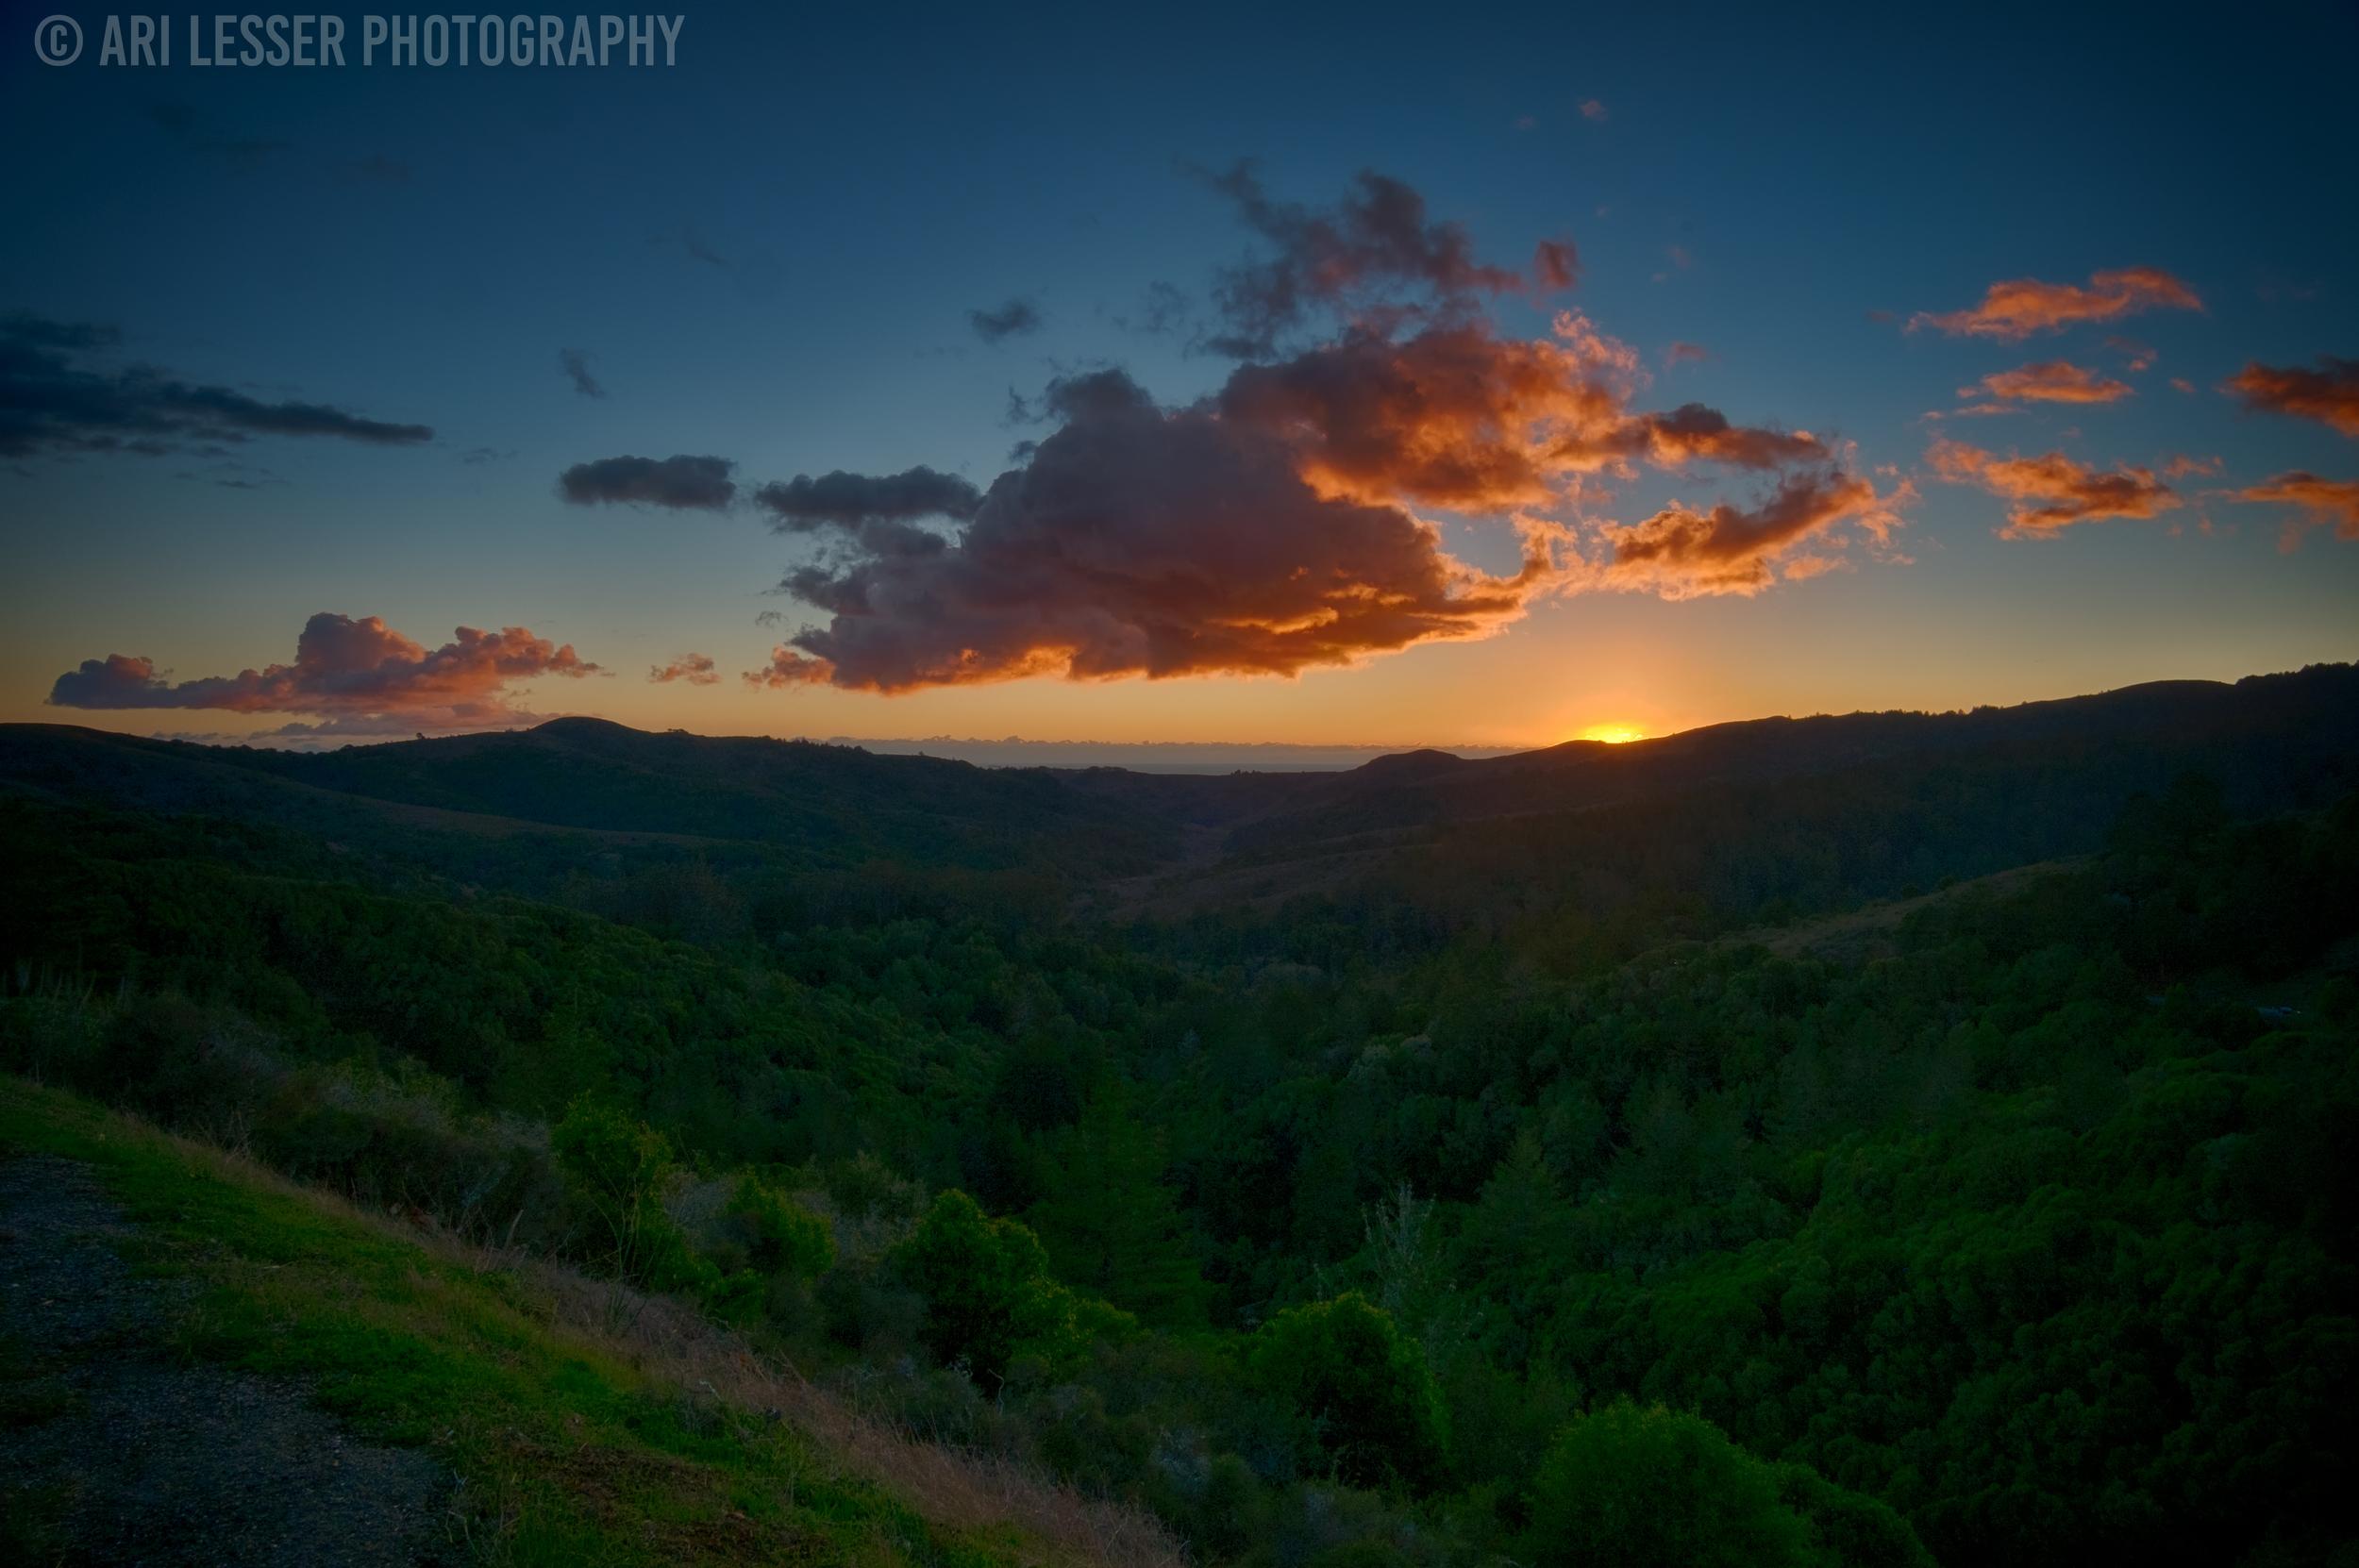 Sunset - Muir Woods